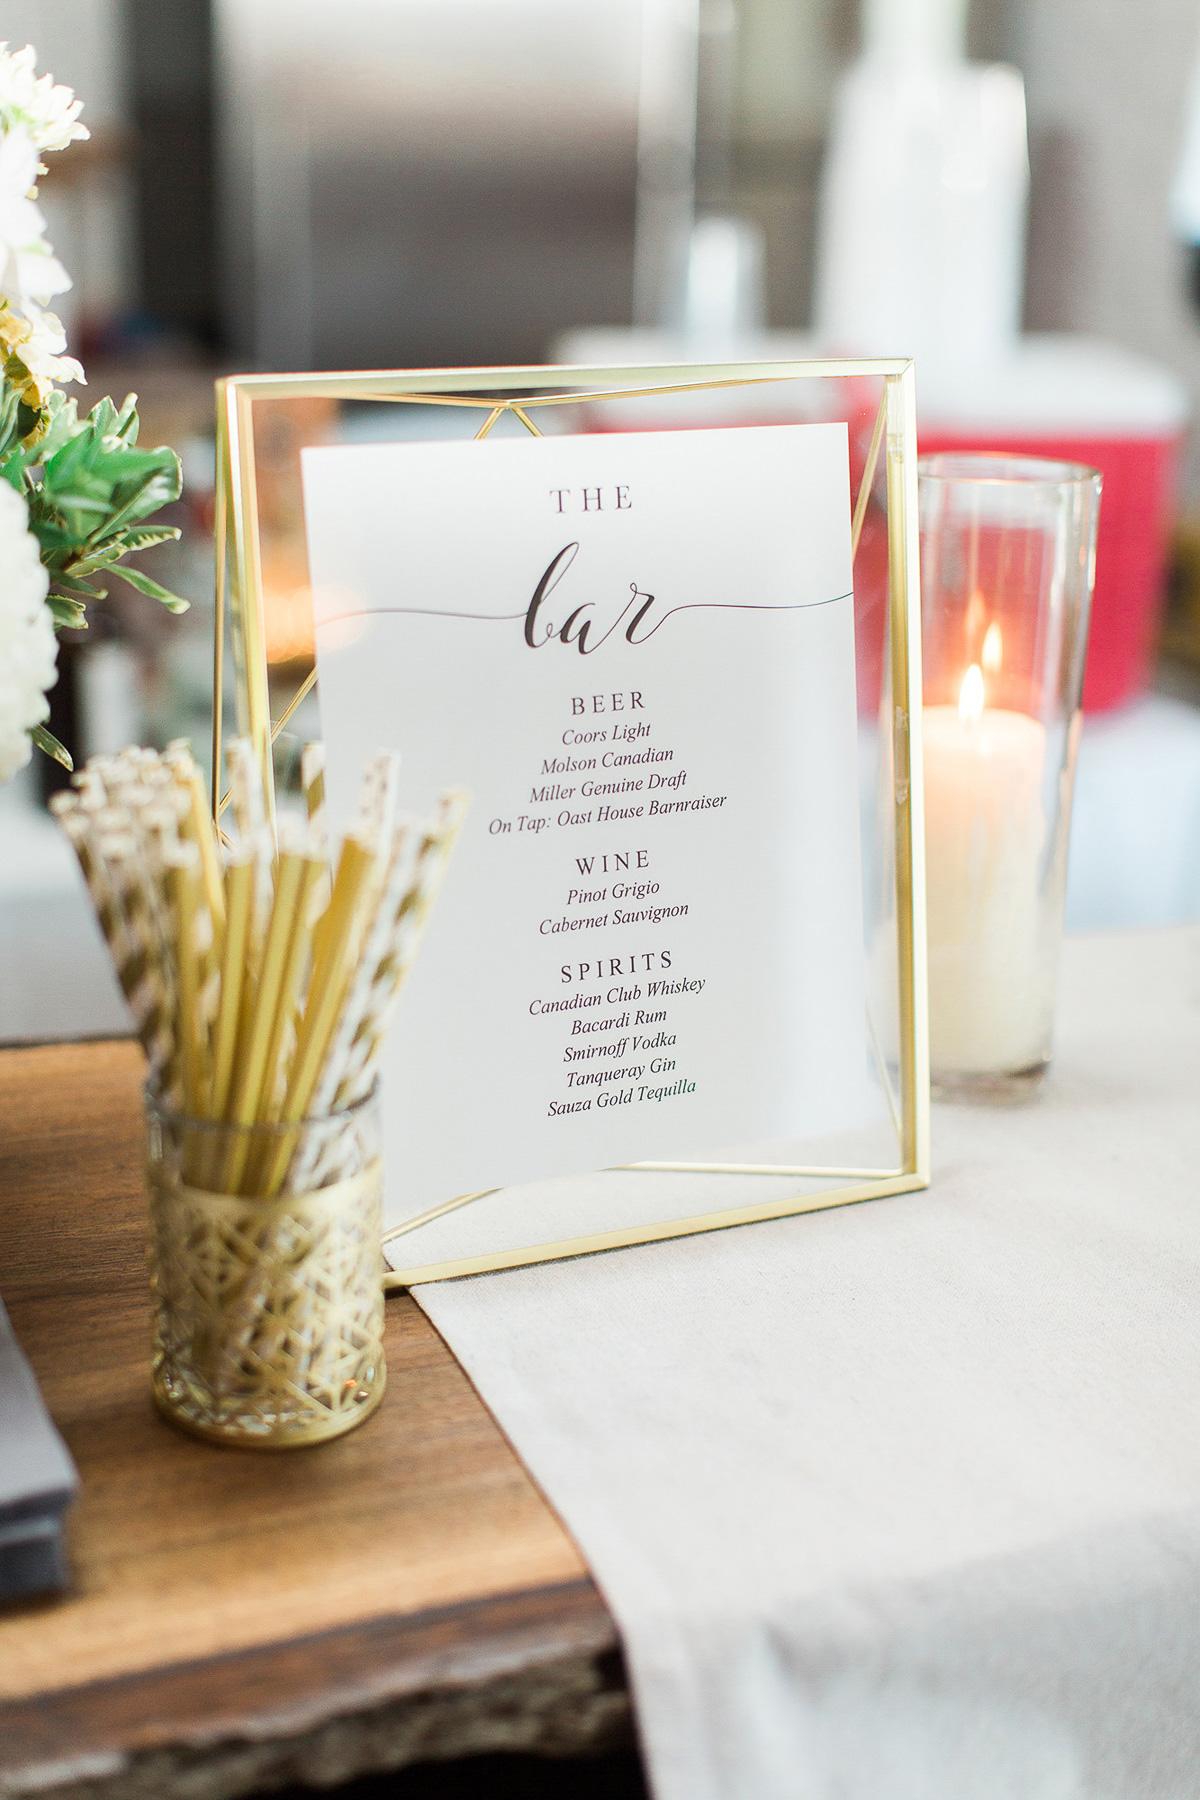 beatrice-elford-photography-vineyard-bride-swish-list-balls-falls-vineland-wedding-56.jpg